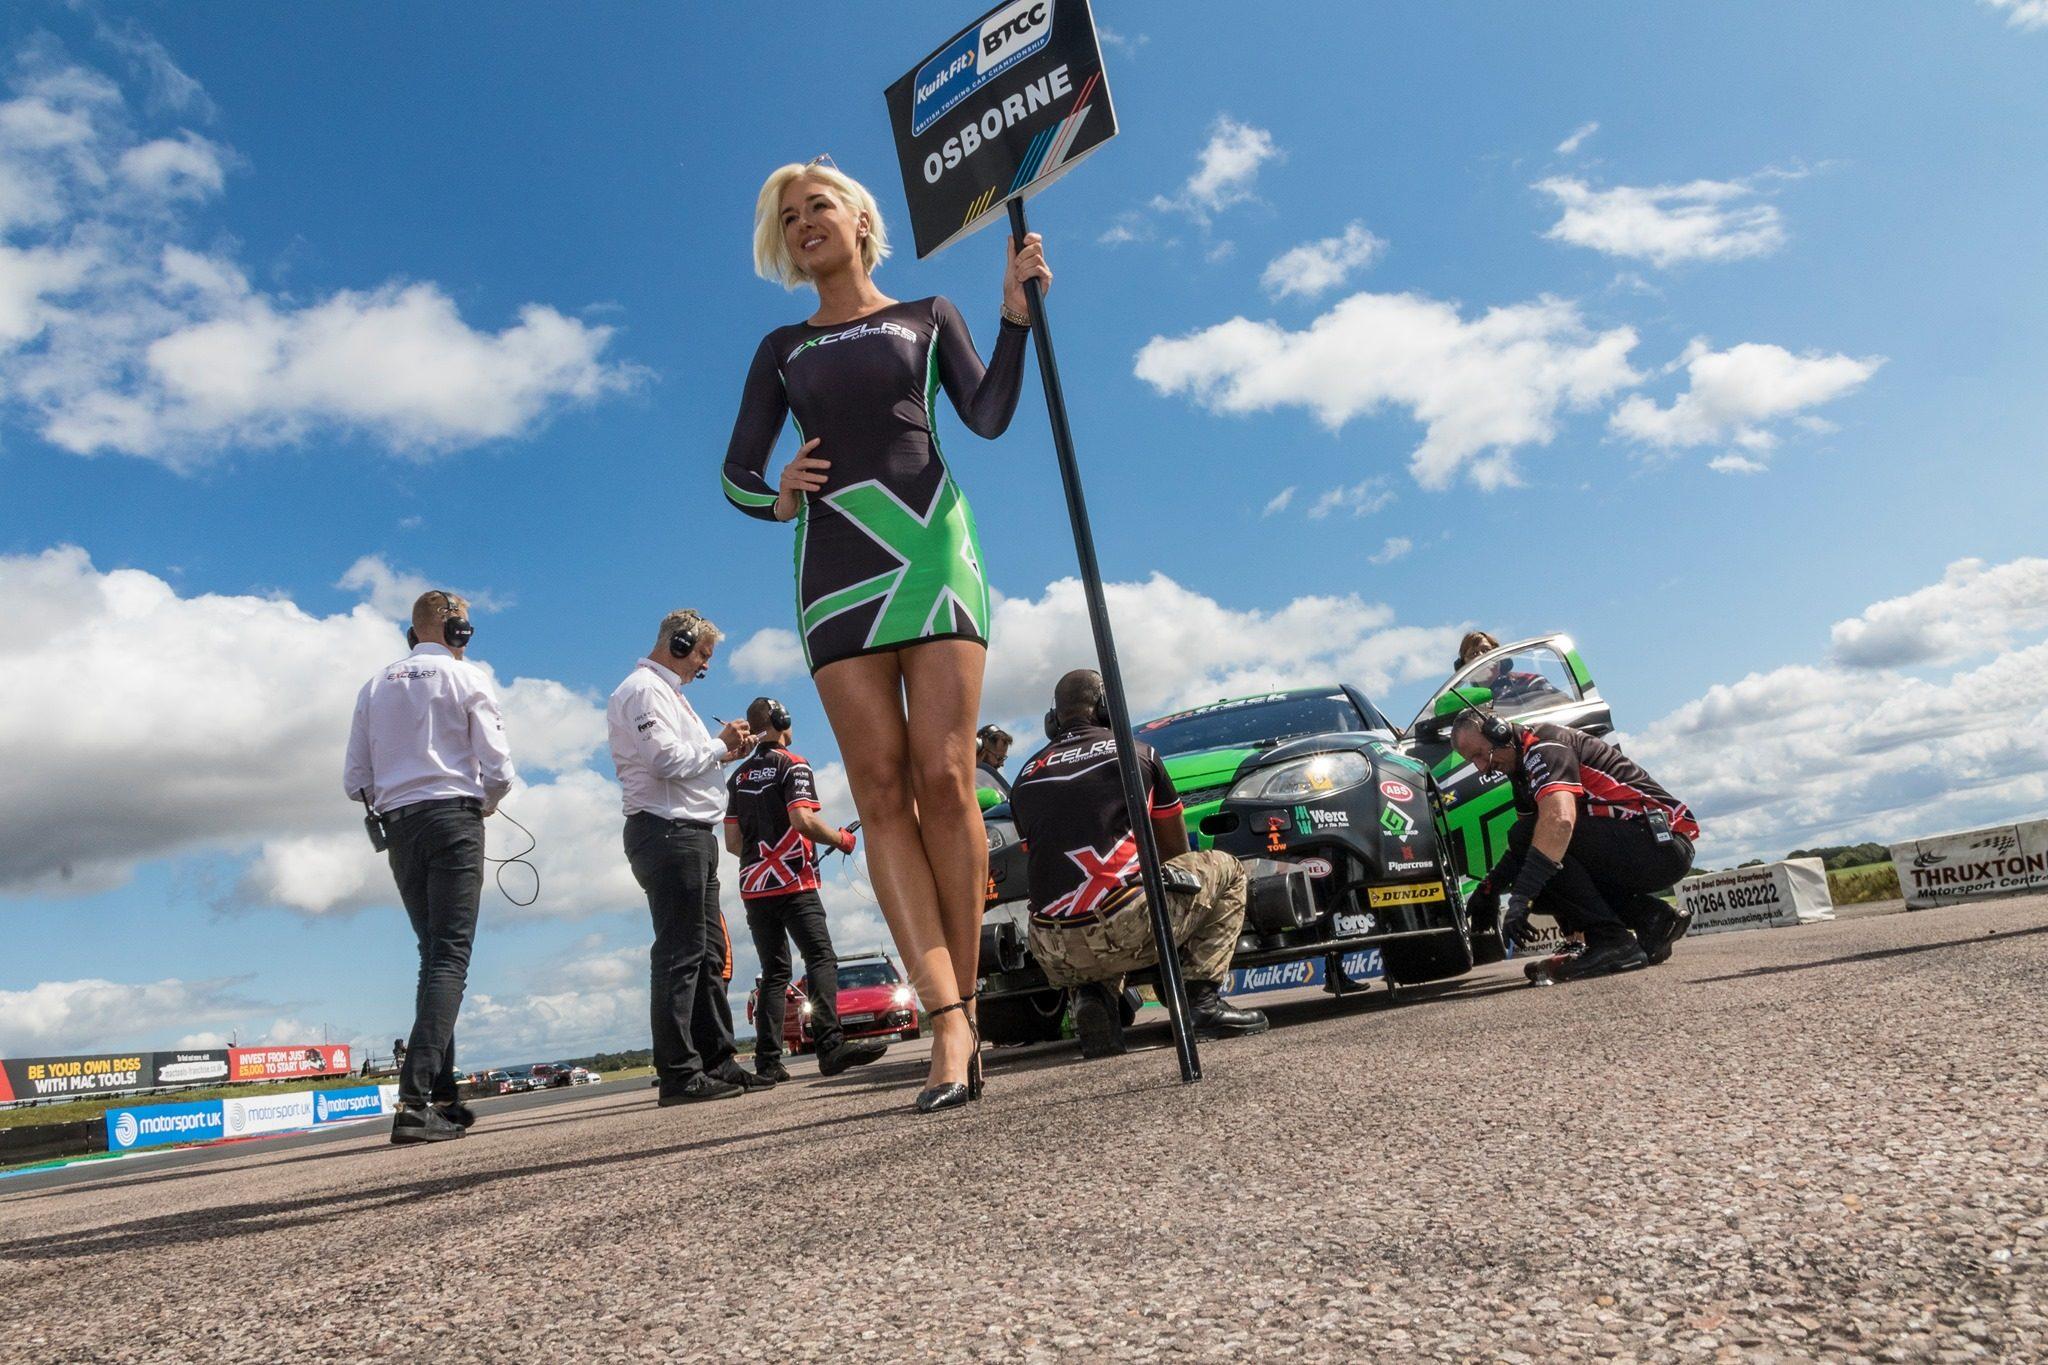 Excelr8 Motorsport BTCC at Thruxton BTCC on Sunday 18th August 2019